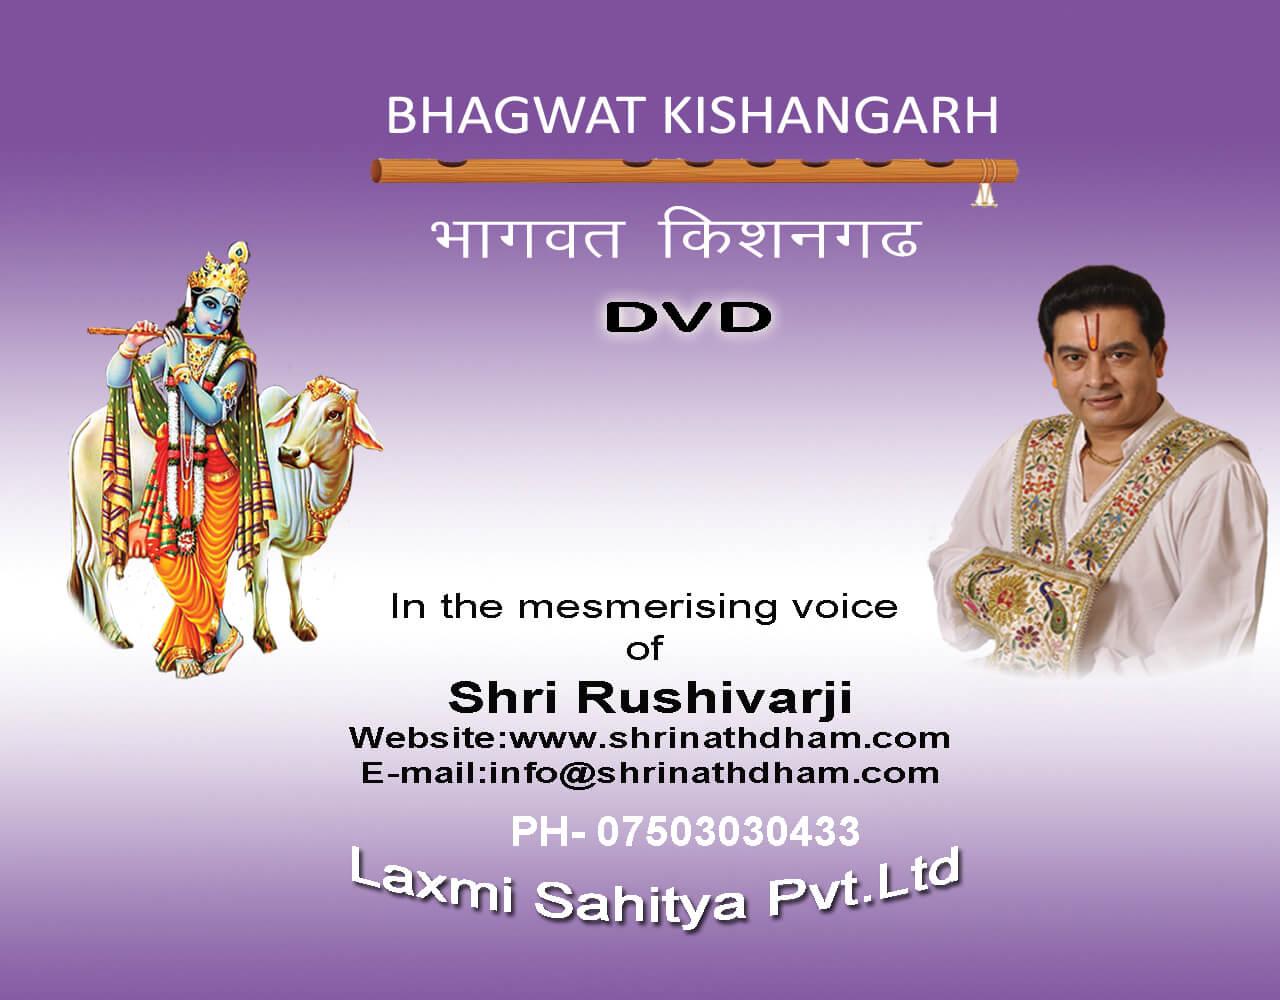 bhagwat-kishangarh